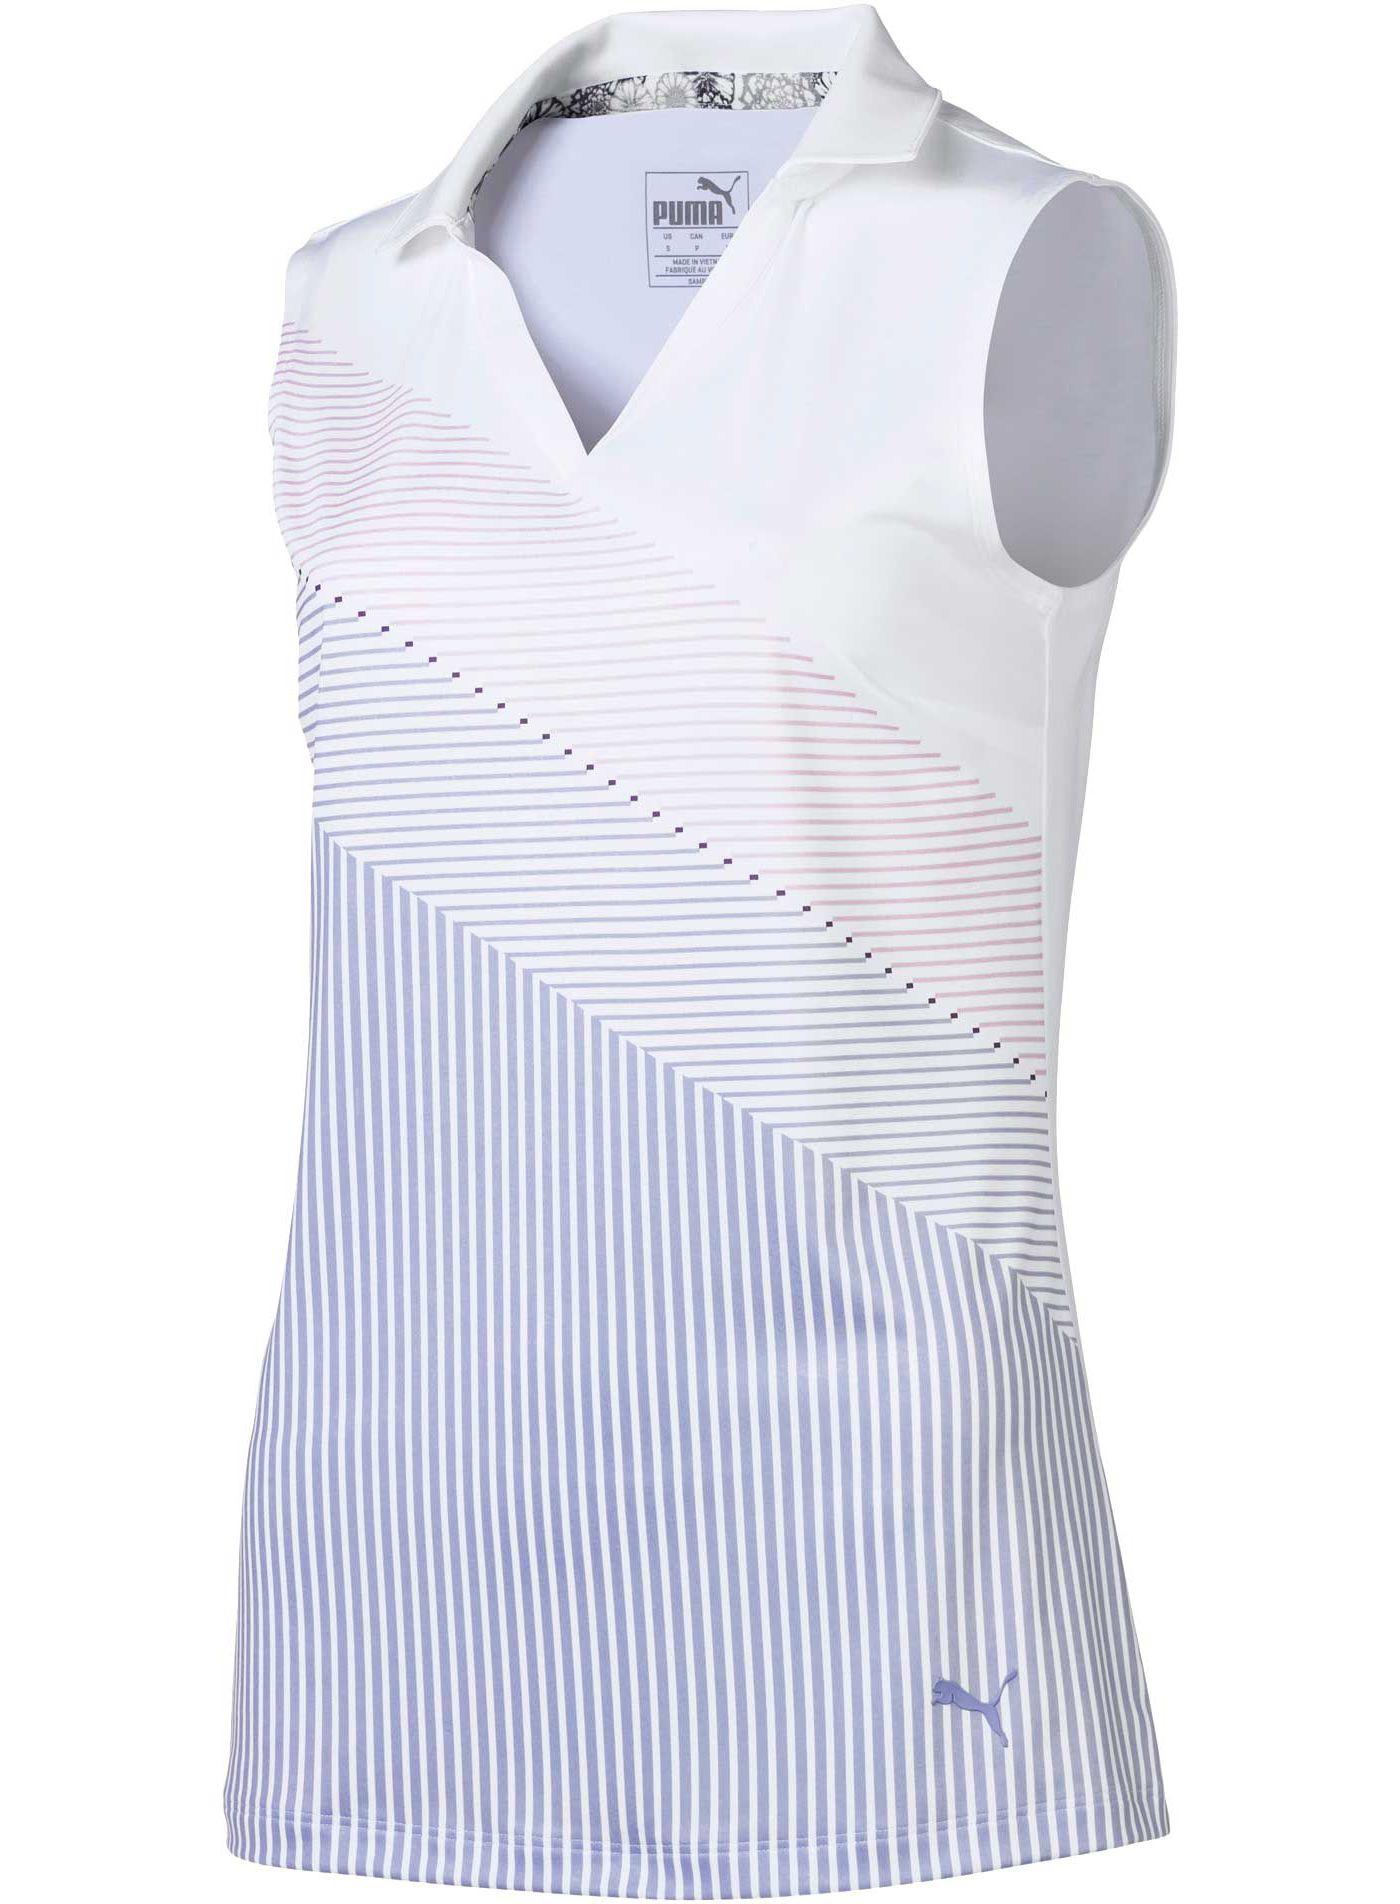 PUMA Women's Prep Sleeveless Golf Polo